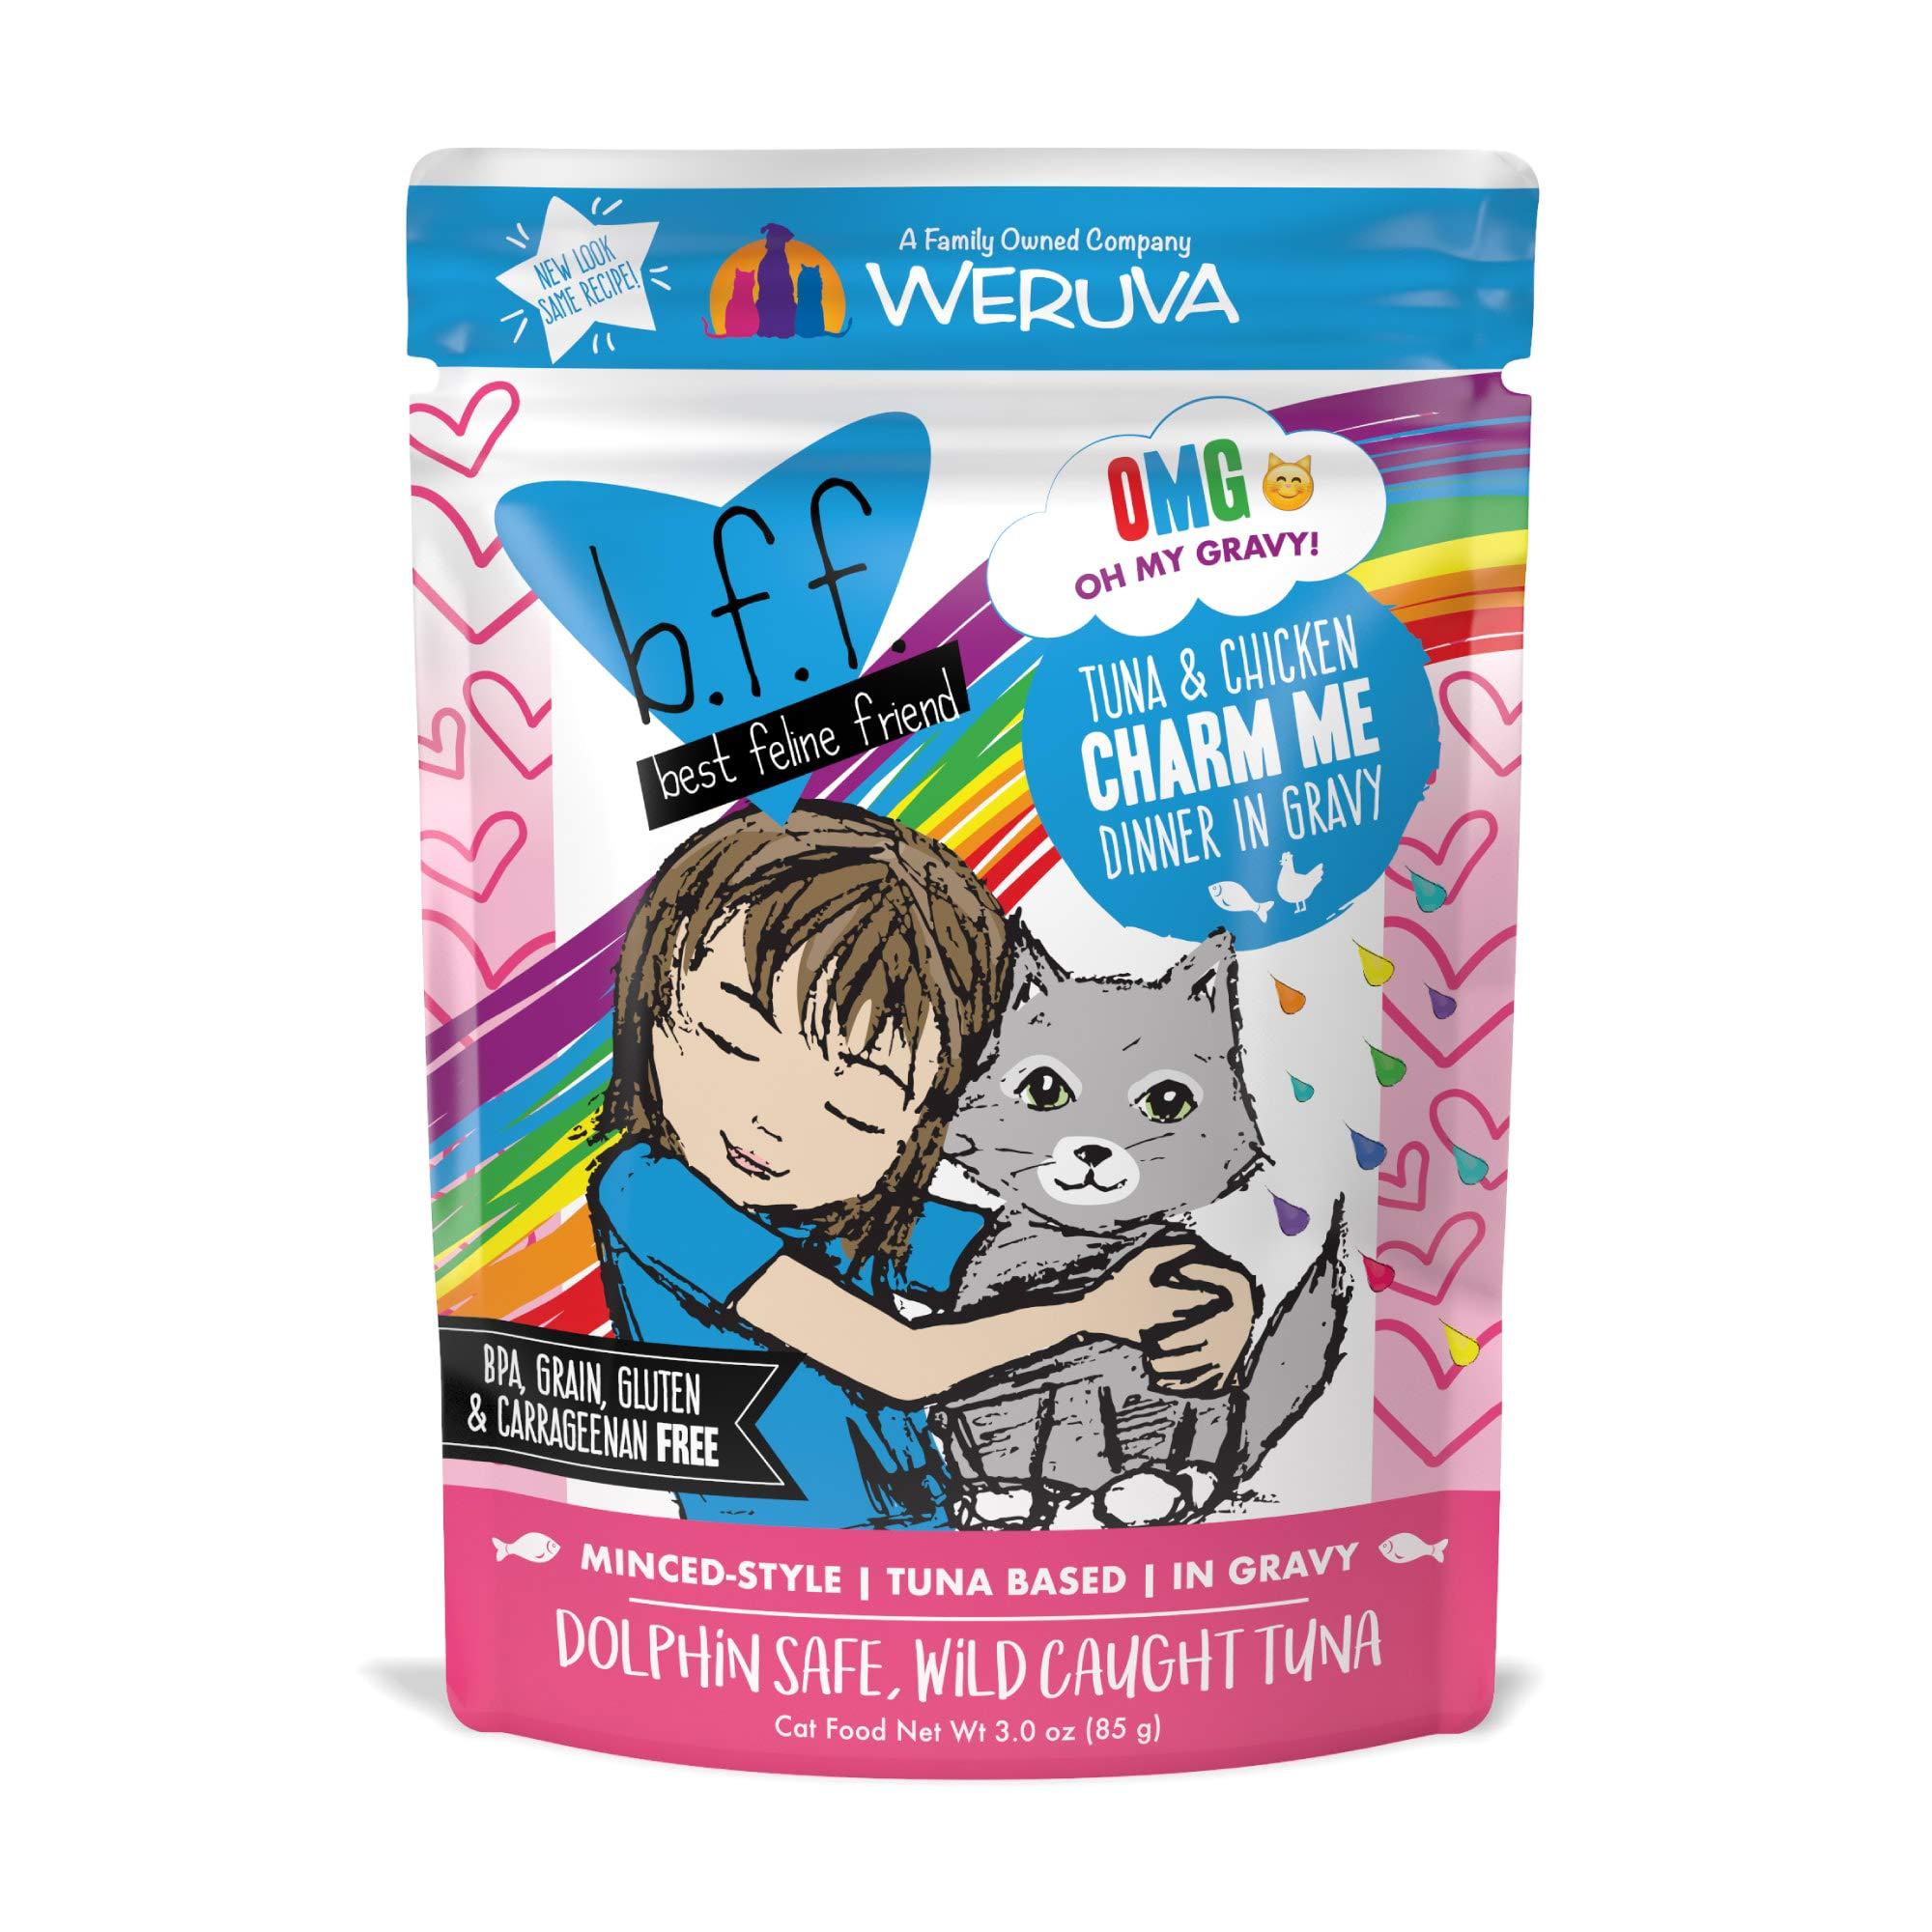 Weruva B.F.F. OMG – Best Feline Friend Oh My Gravy! Grain-Free Natural Wet Cat Food Pouches, Original Tuna Recipes in…